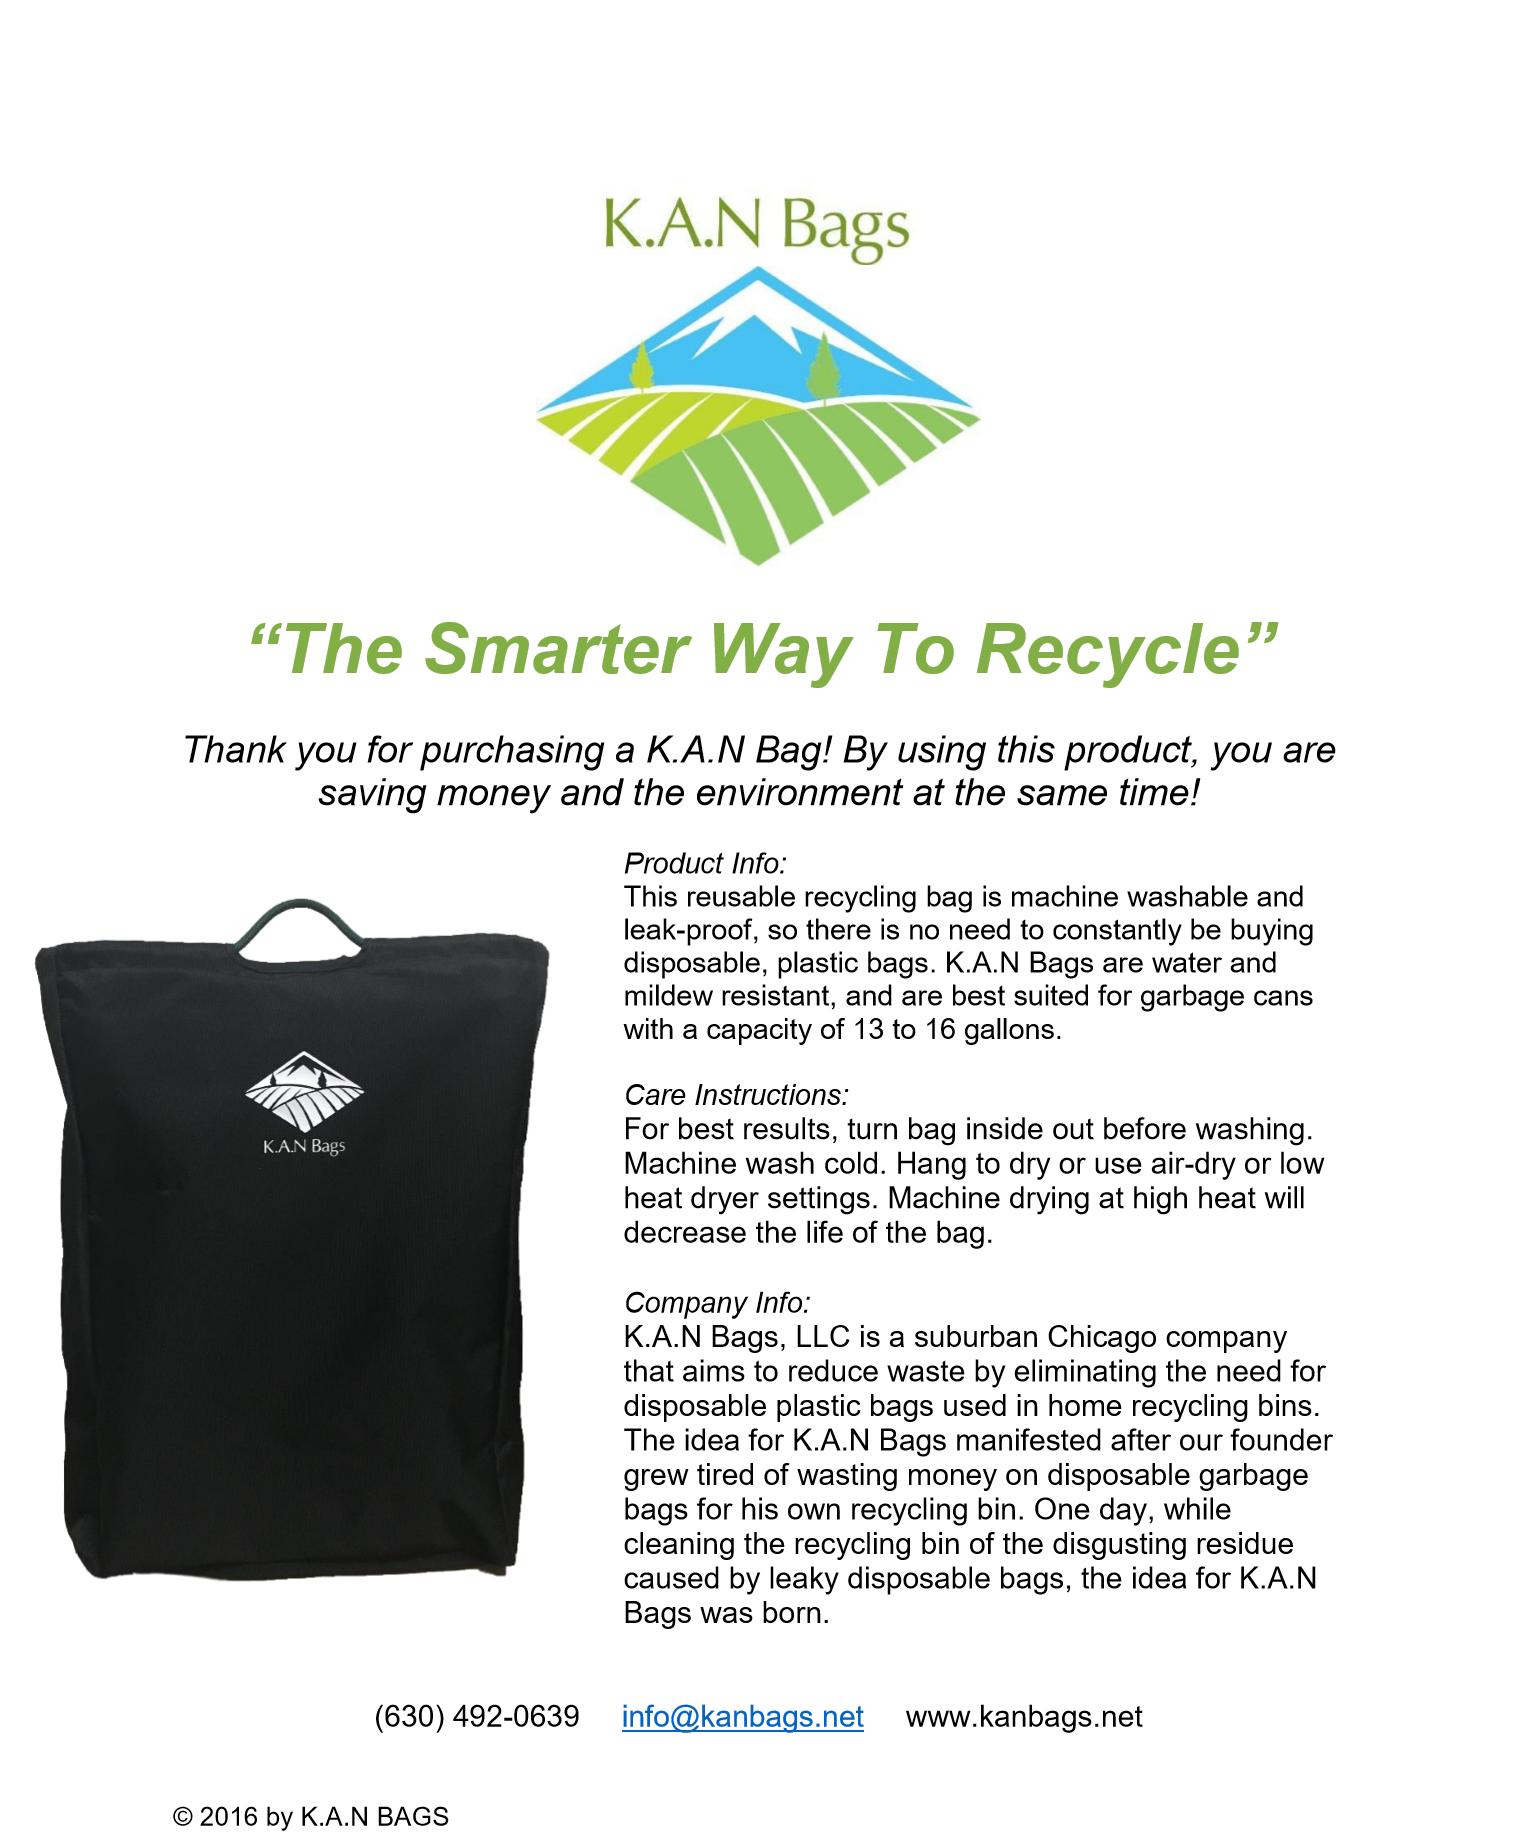 Product Info Sheet K.A.N Bags